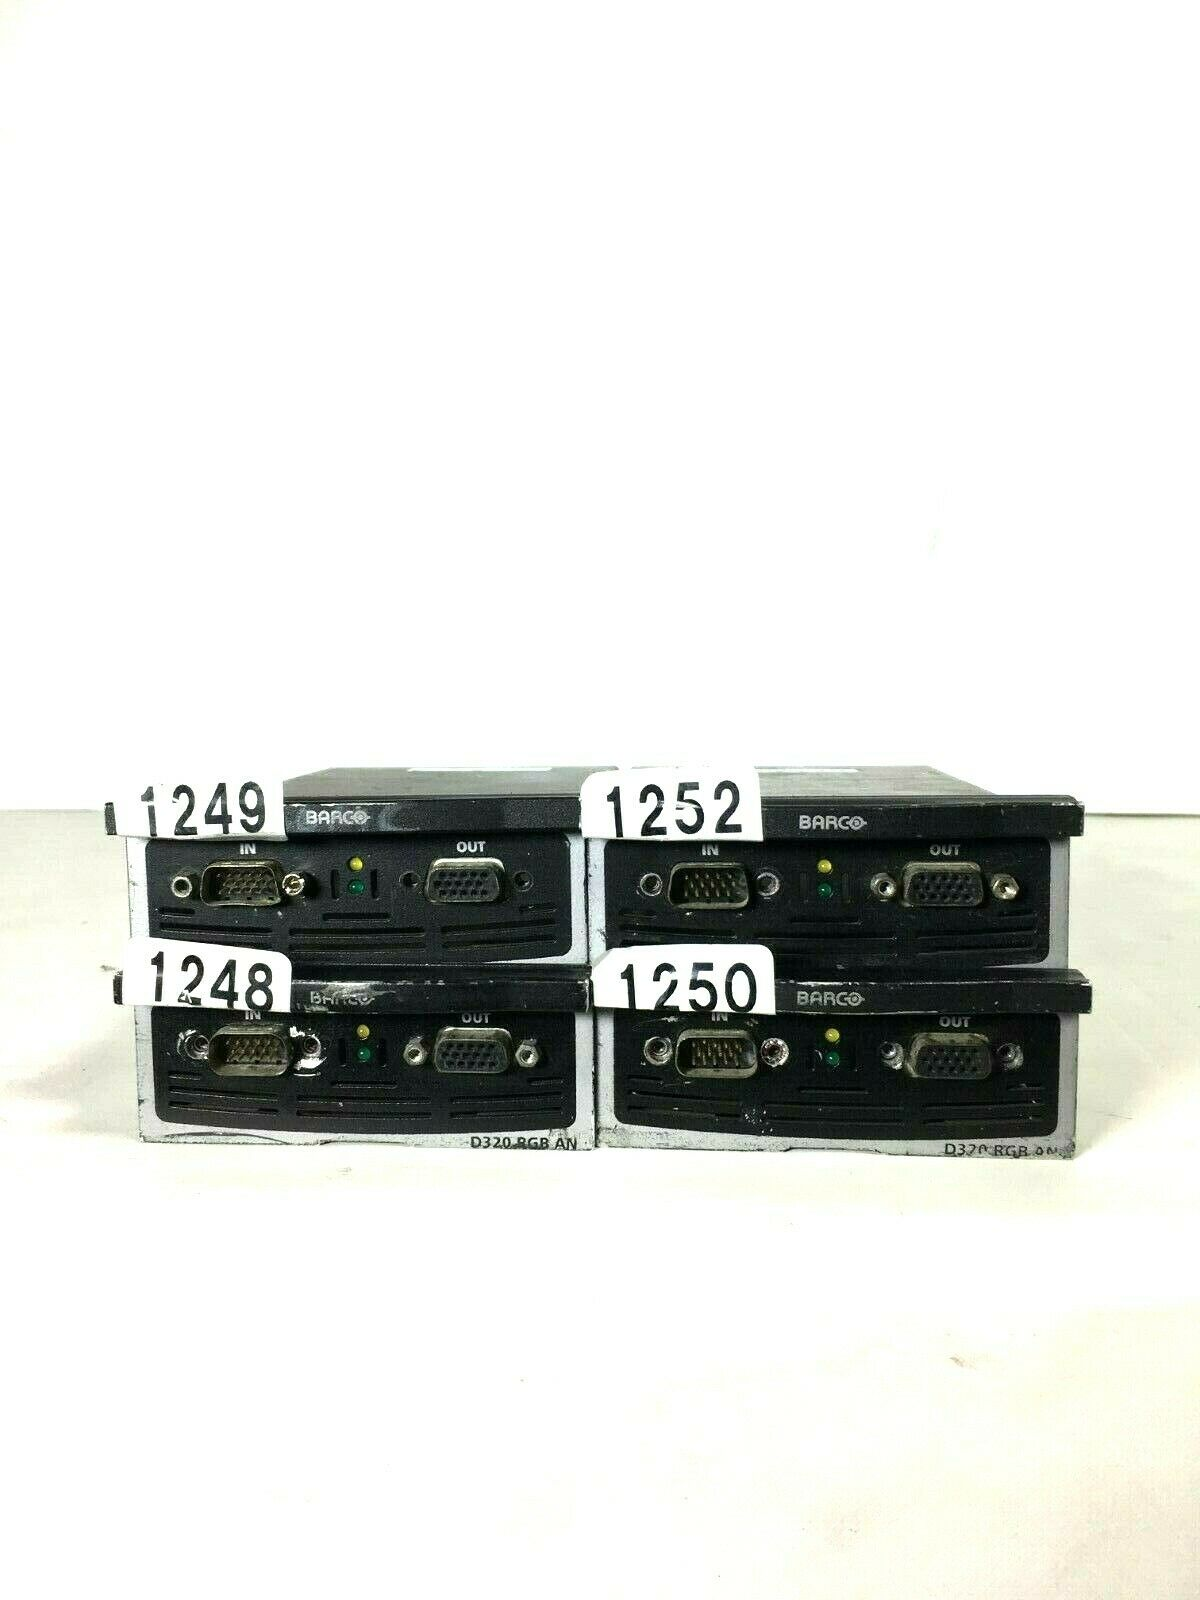 BARCO XL D320 RGB AN PROCESSOR CARD (ONE)